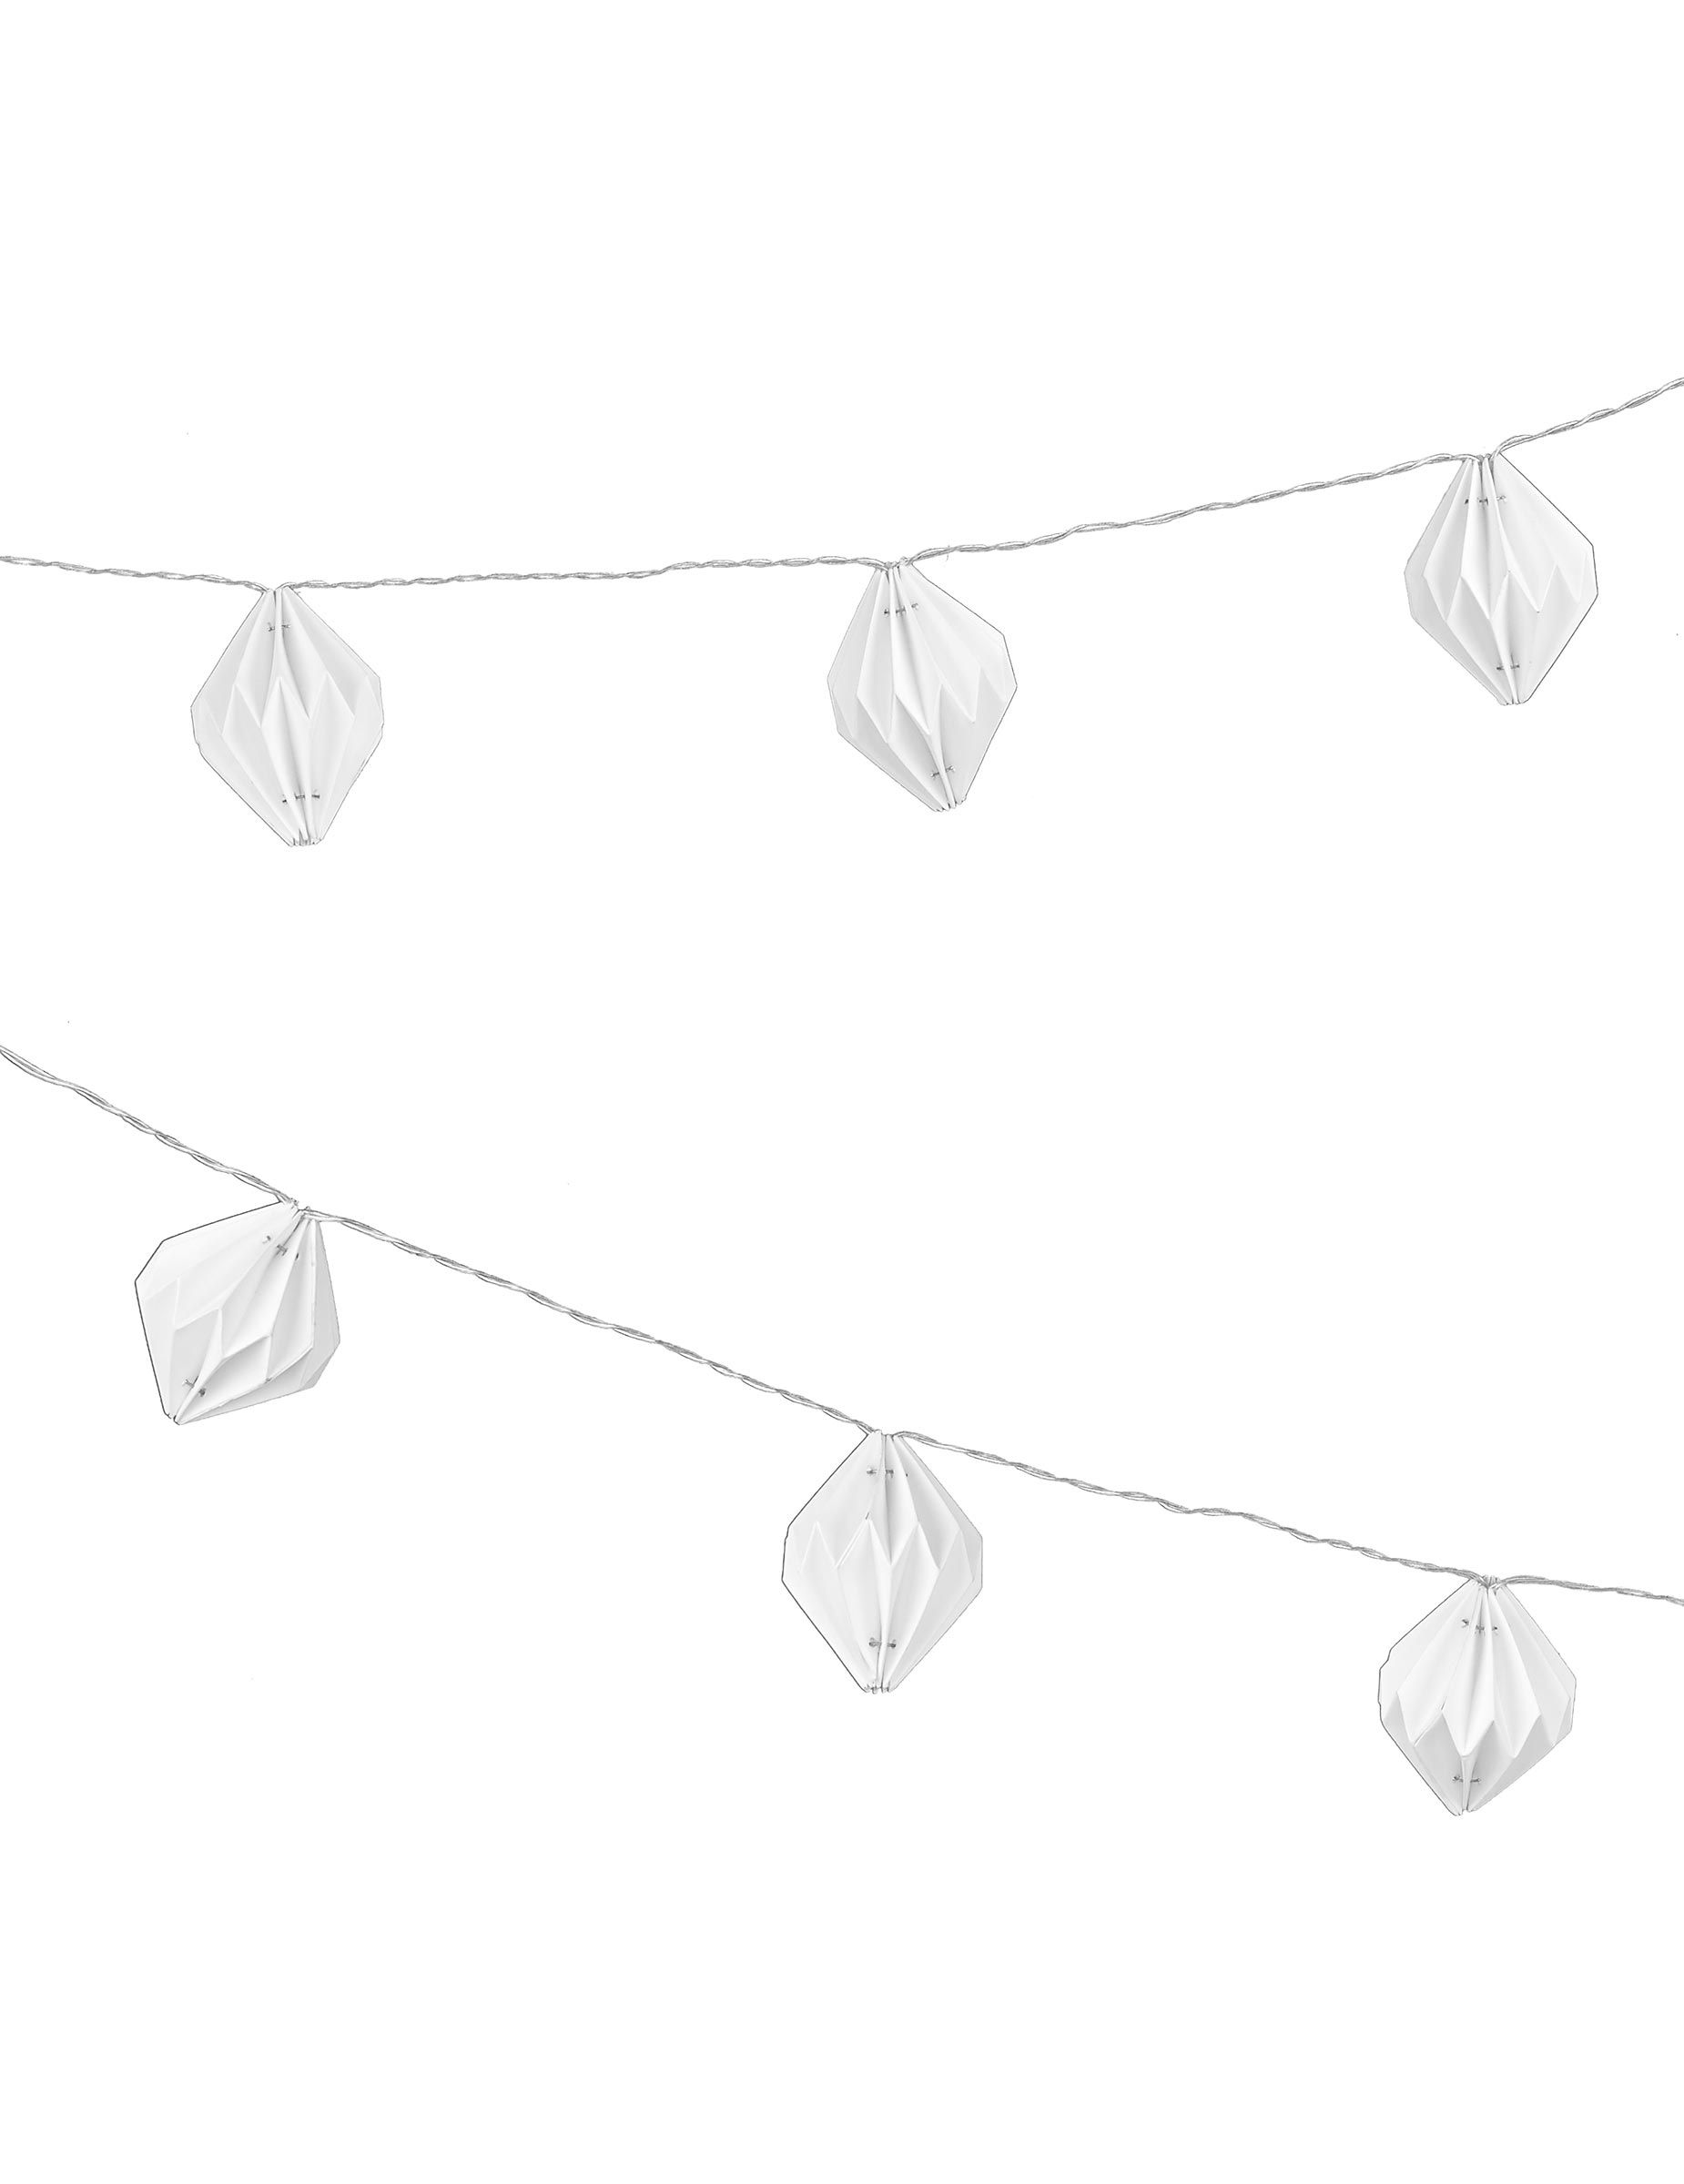 guirlande lumineuse origami blanche 2m10 d coration anniversaire et f tes th me sur vegaoo party. Black Bedroom Furniture Sets. Home Design Ideas